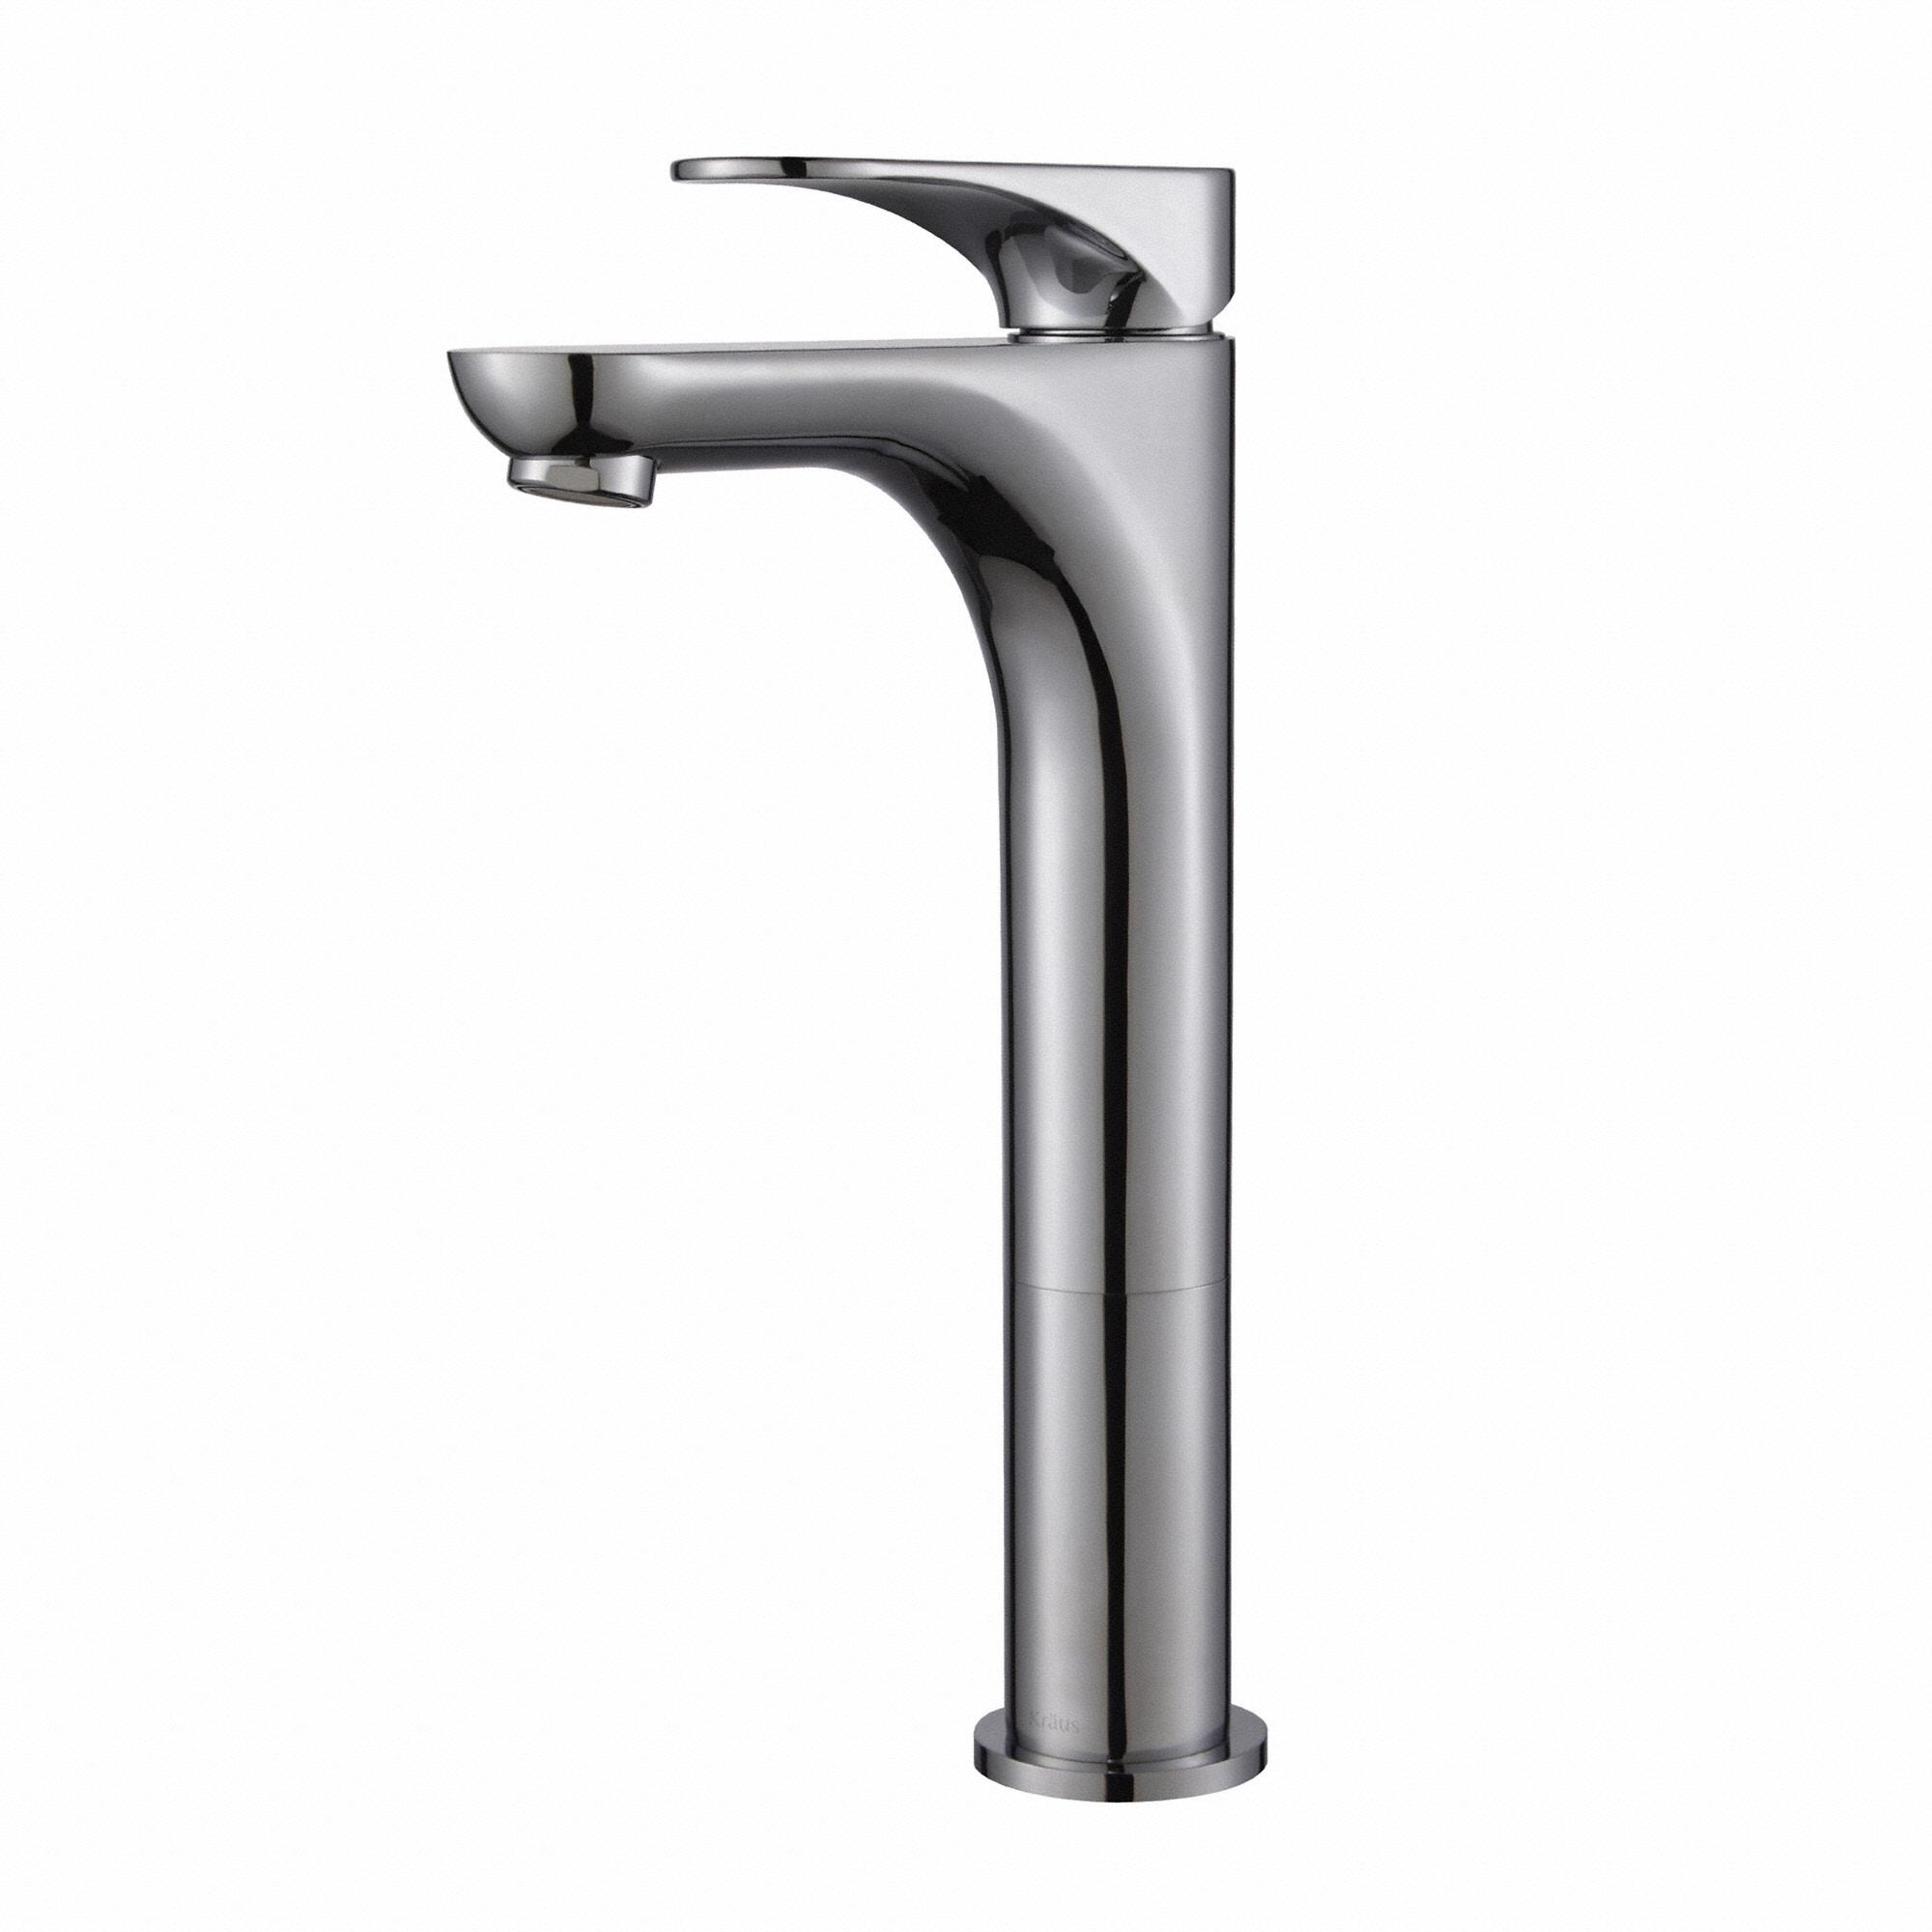 Kraus FVS-13900 Aquila™ Single Hole Vessel Bathroom Faucet